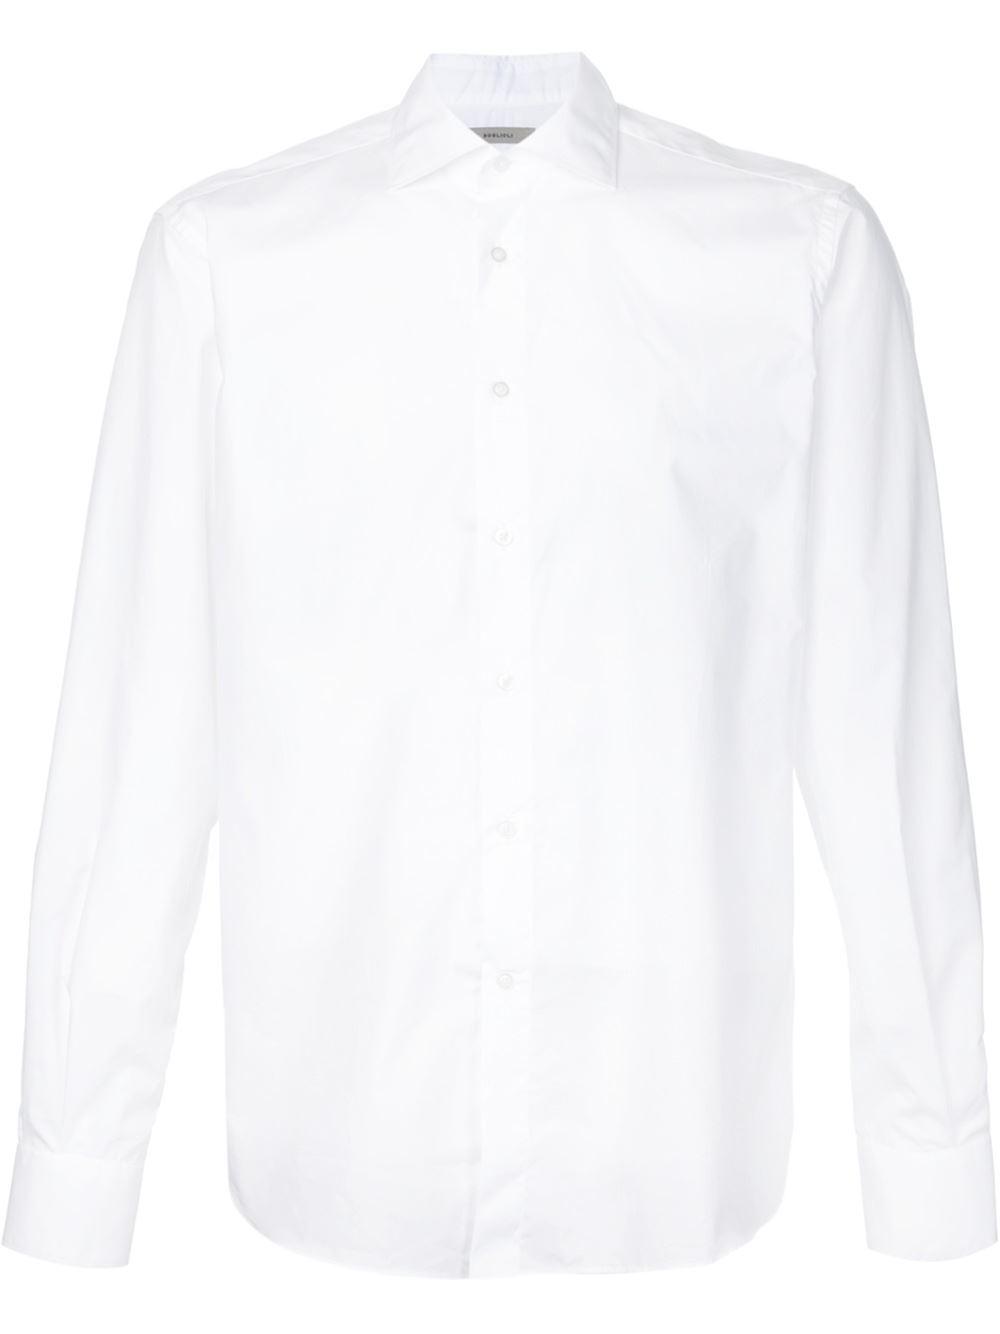 Boglioli cutaway collar shirt in white for men lyst for White cutaway collar shirt